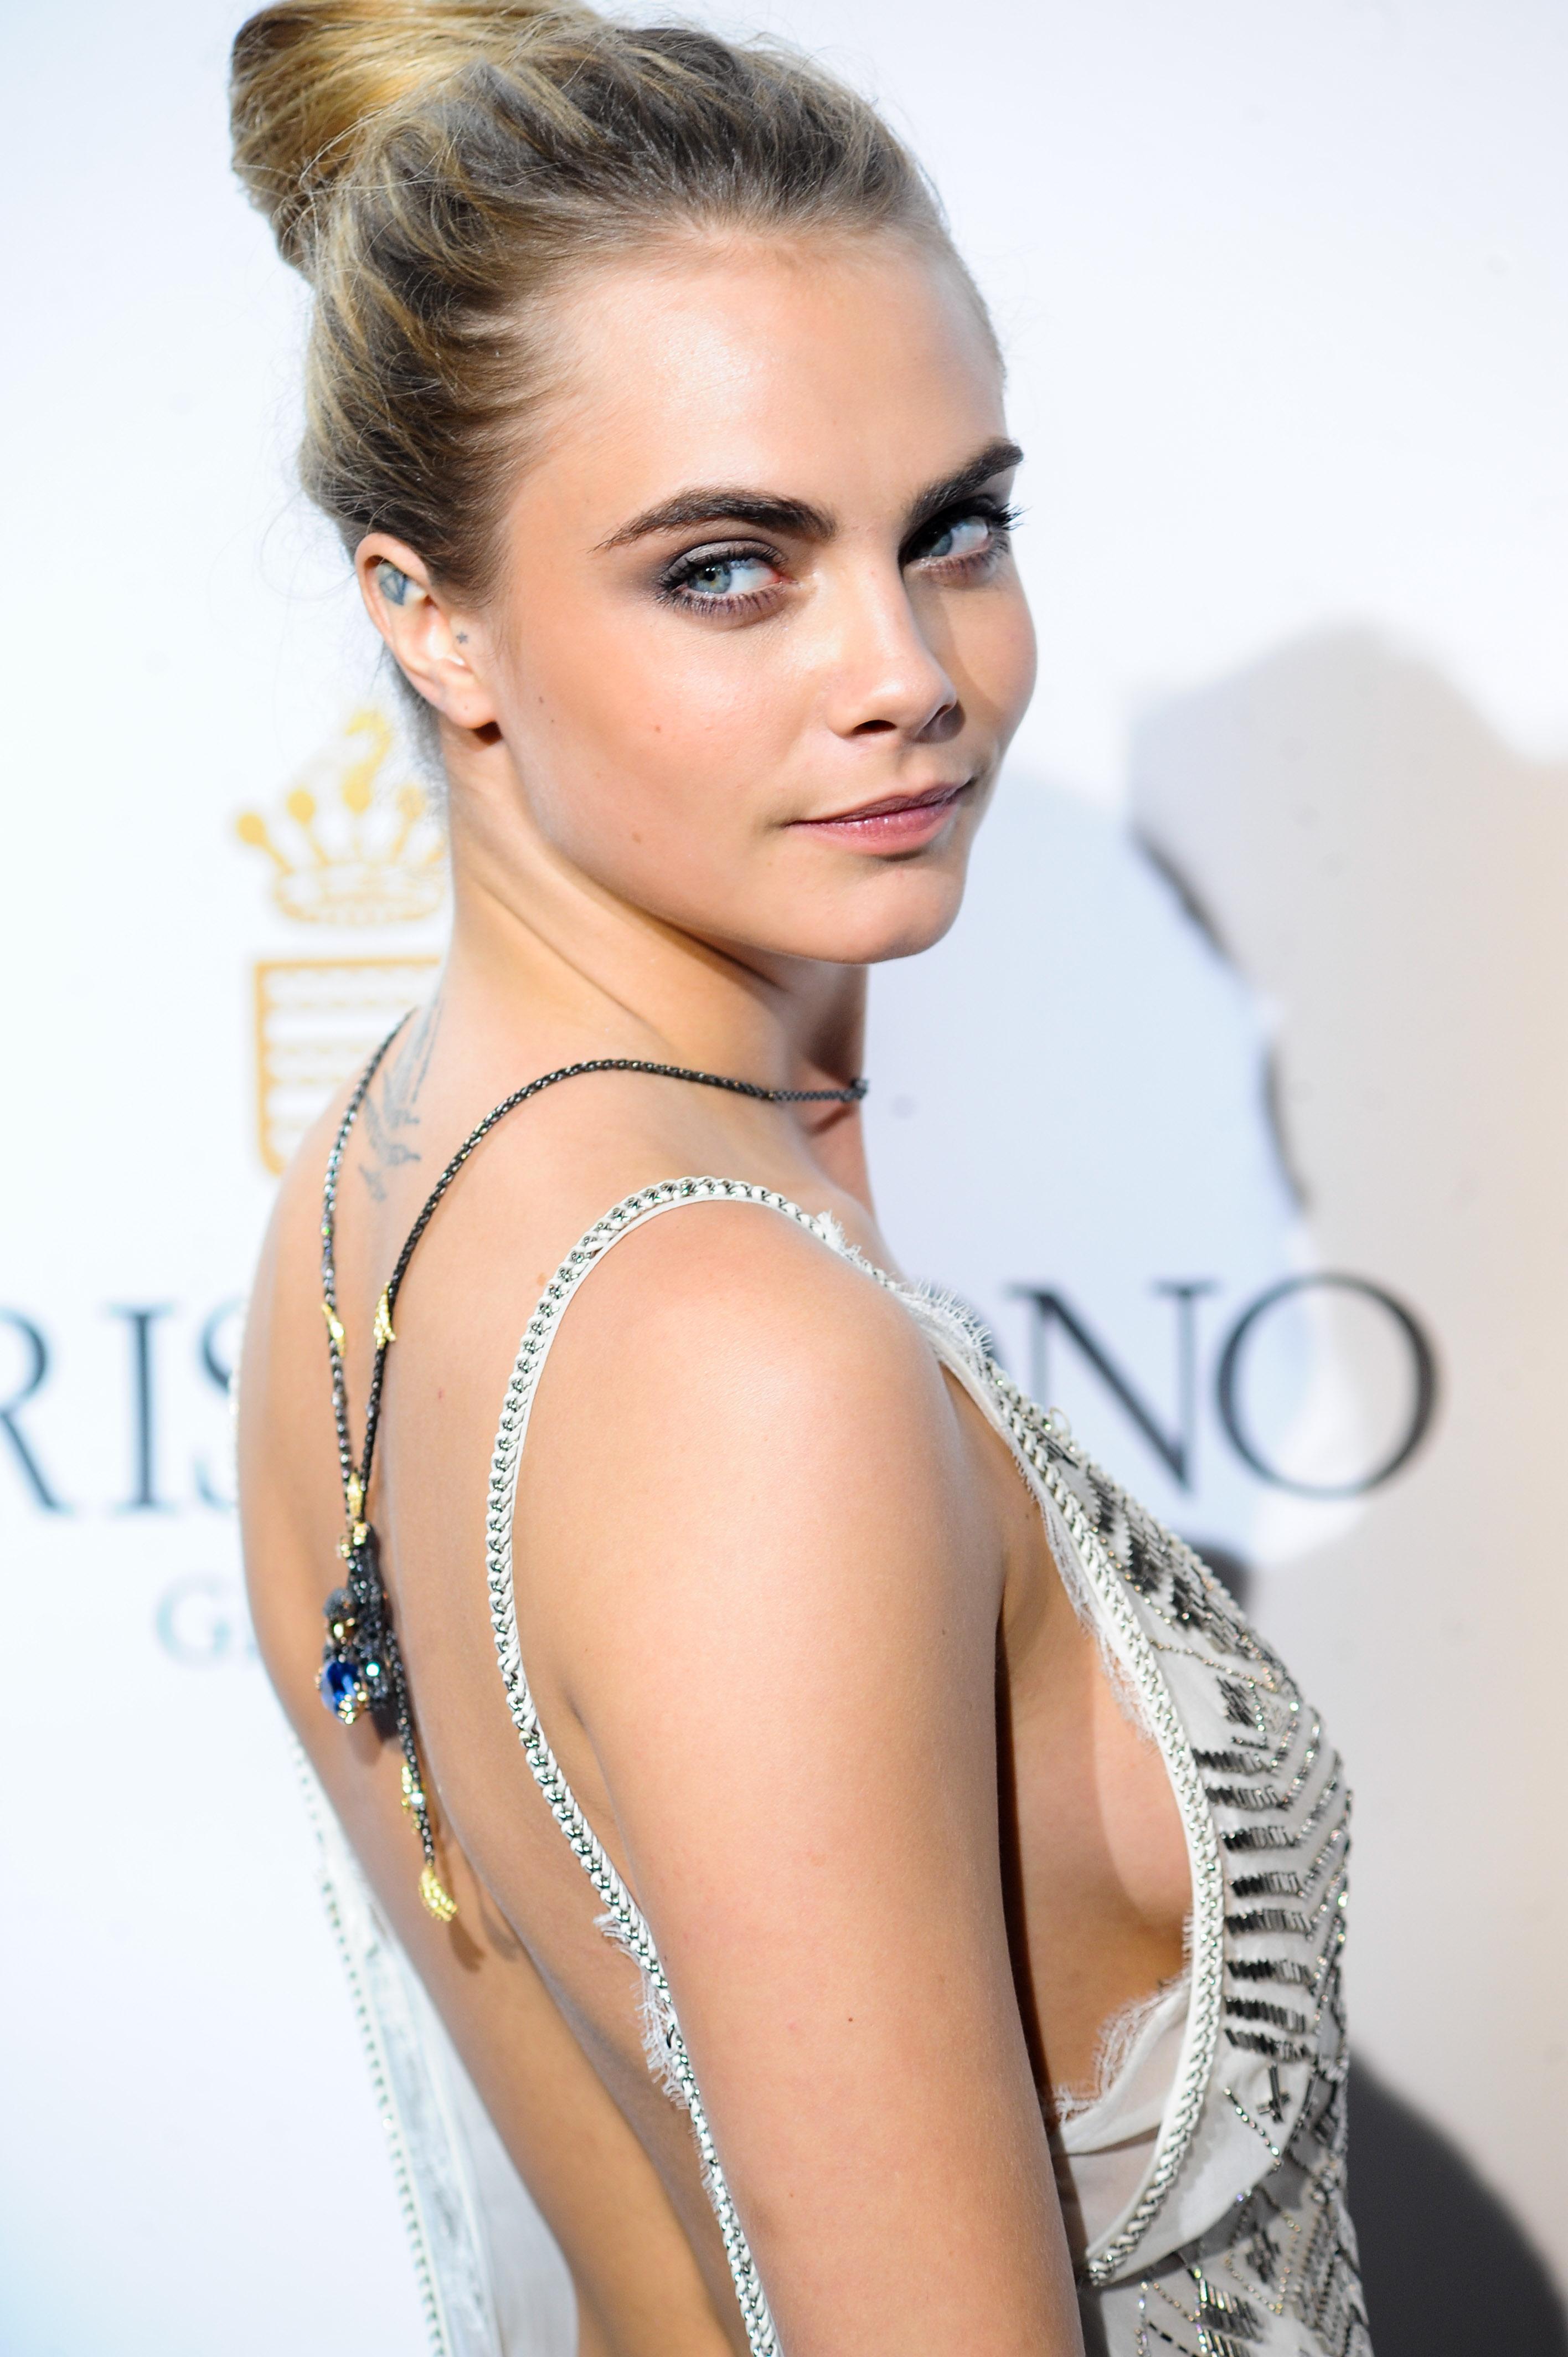 The 67th Annual Cannes Film Festival - de Grisogono 'Fatale In Cannes' party